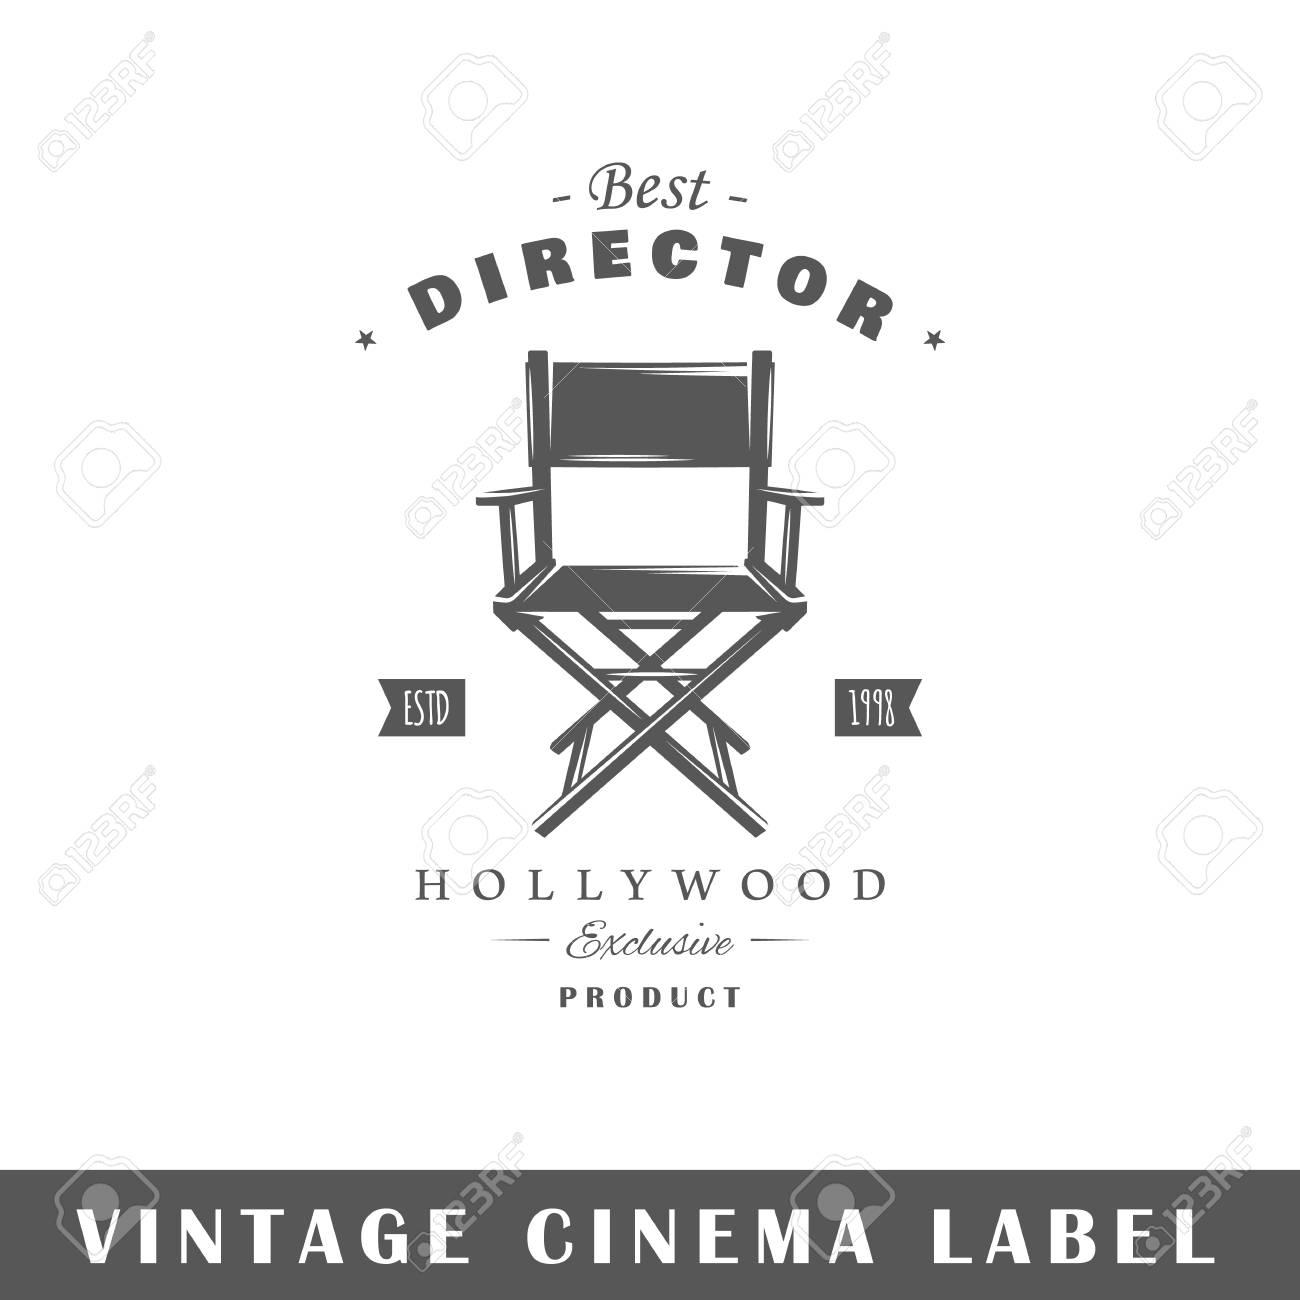 Etiqueta De Cine Aislada Sobre Fondo Blanco. Elemento De Diseño ...